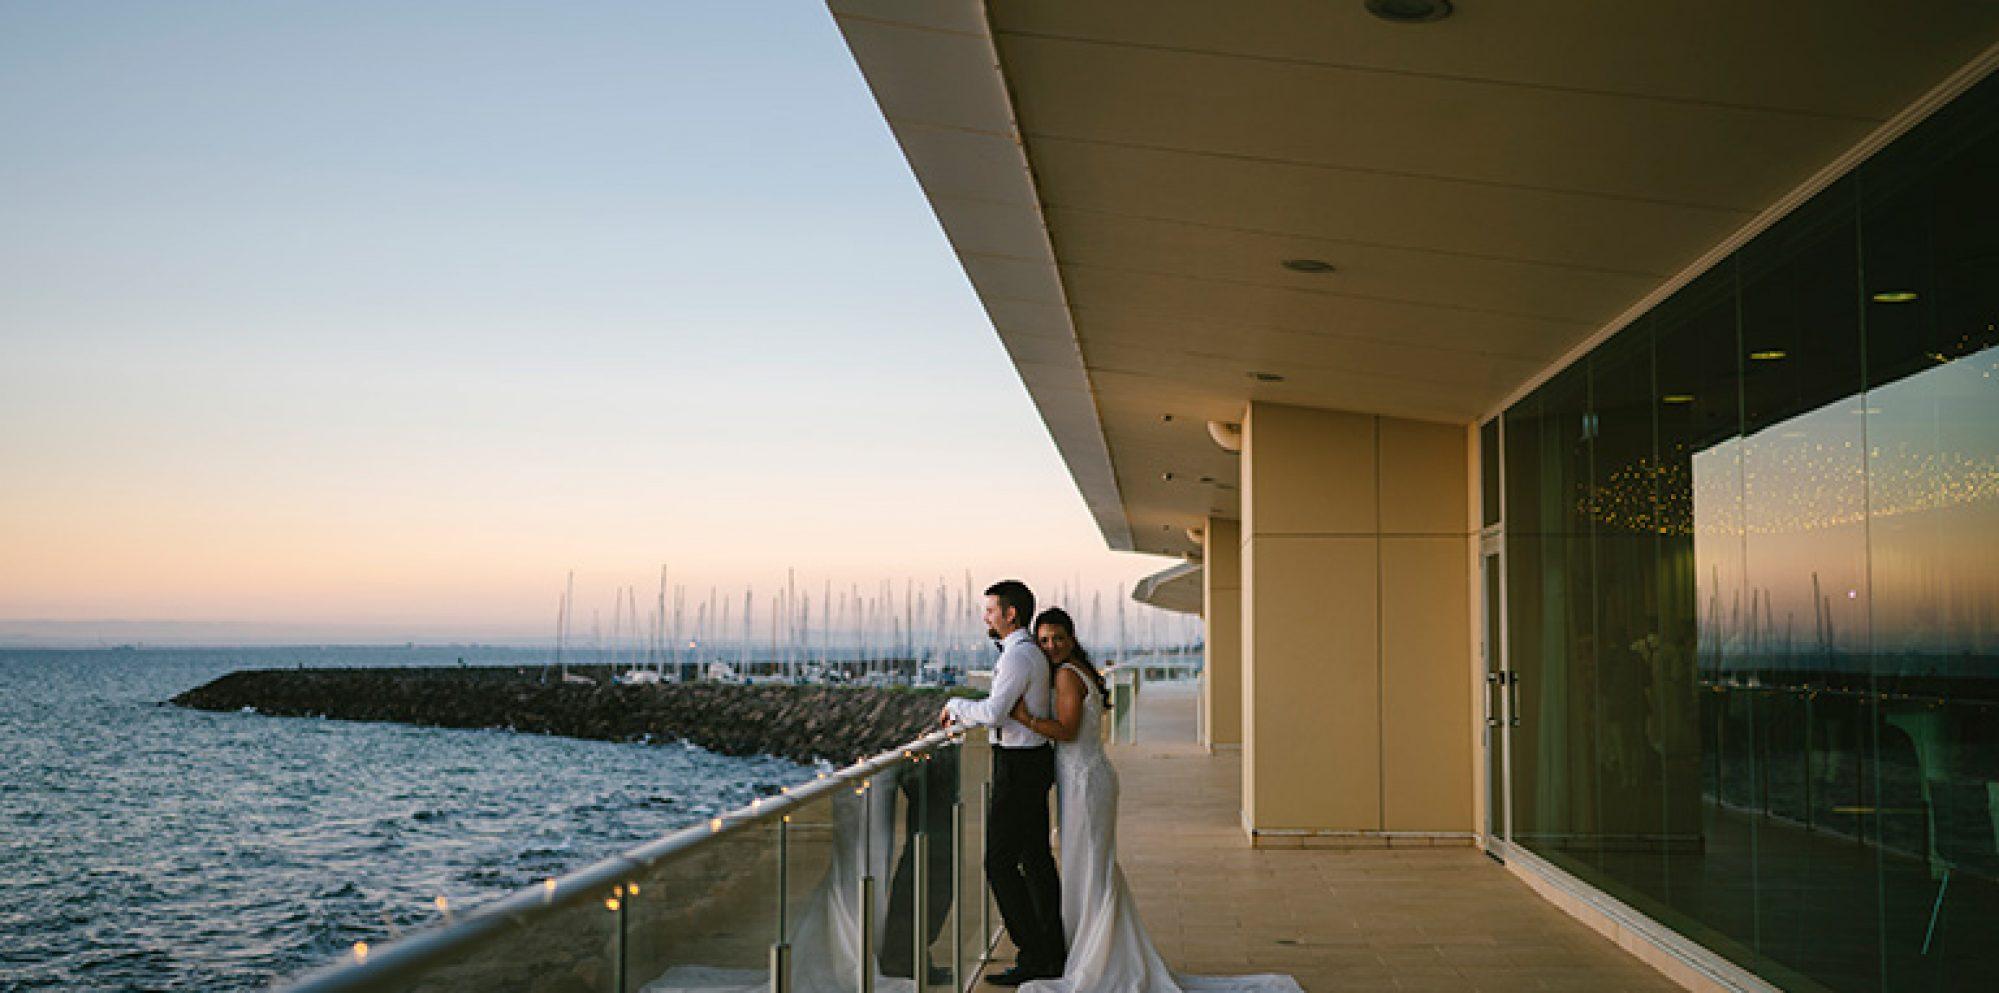 Renee & damian wedding photography @ sandringham yacht club